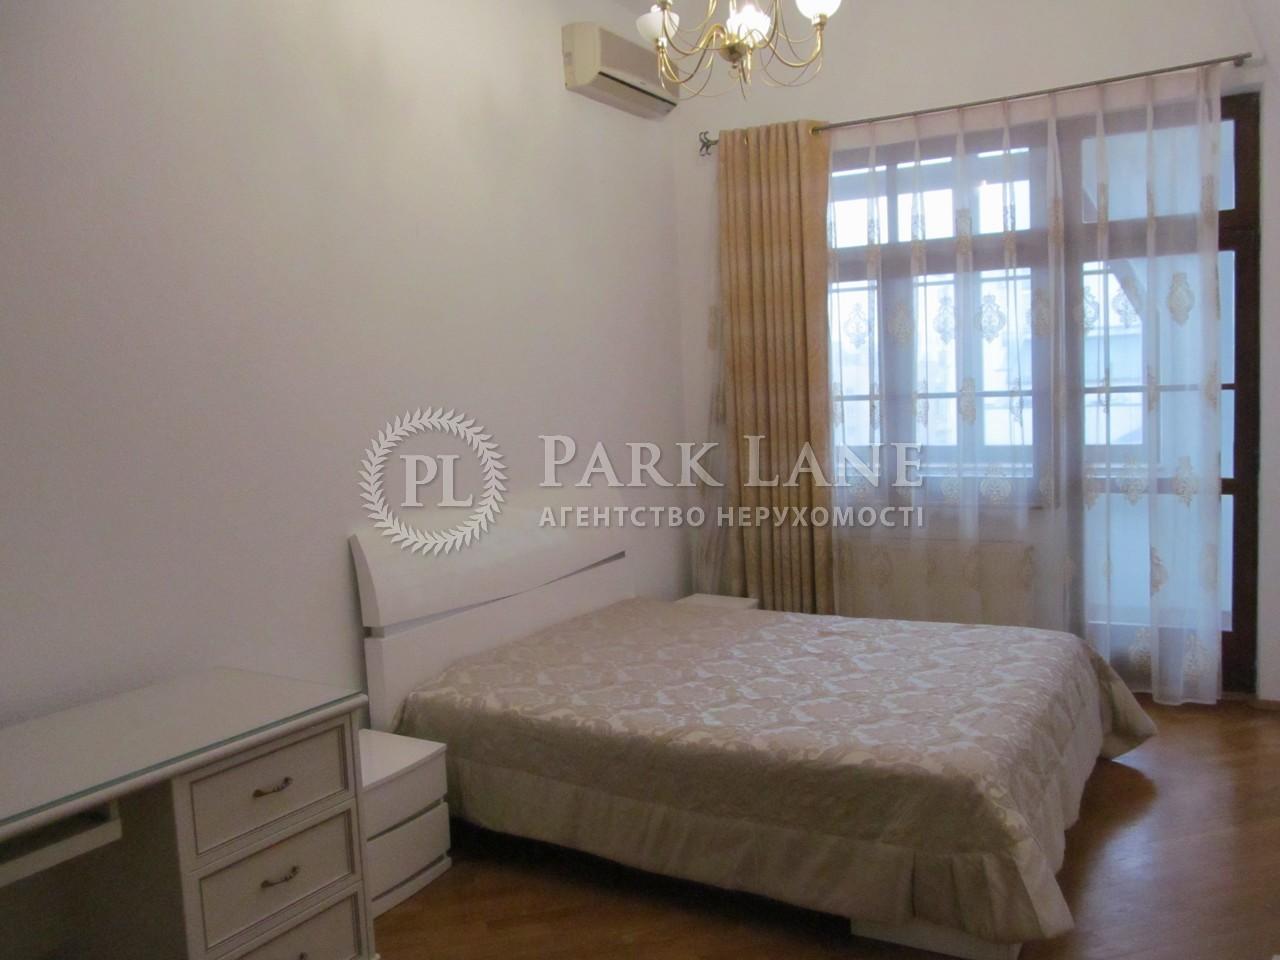 Квартира ул. Павловская, 18, Киев, C-72808 - Фото 18